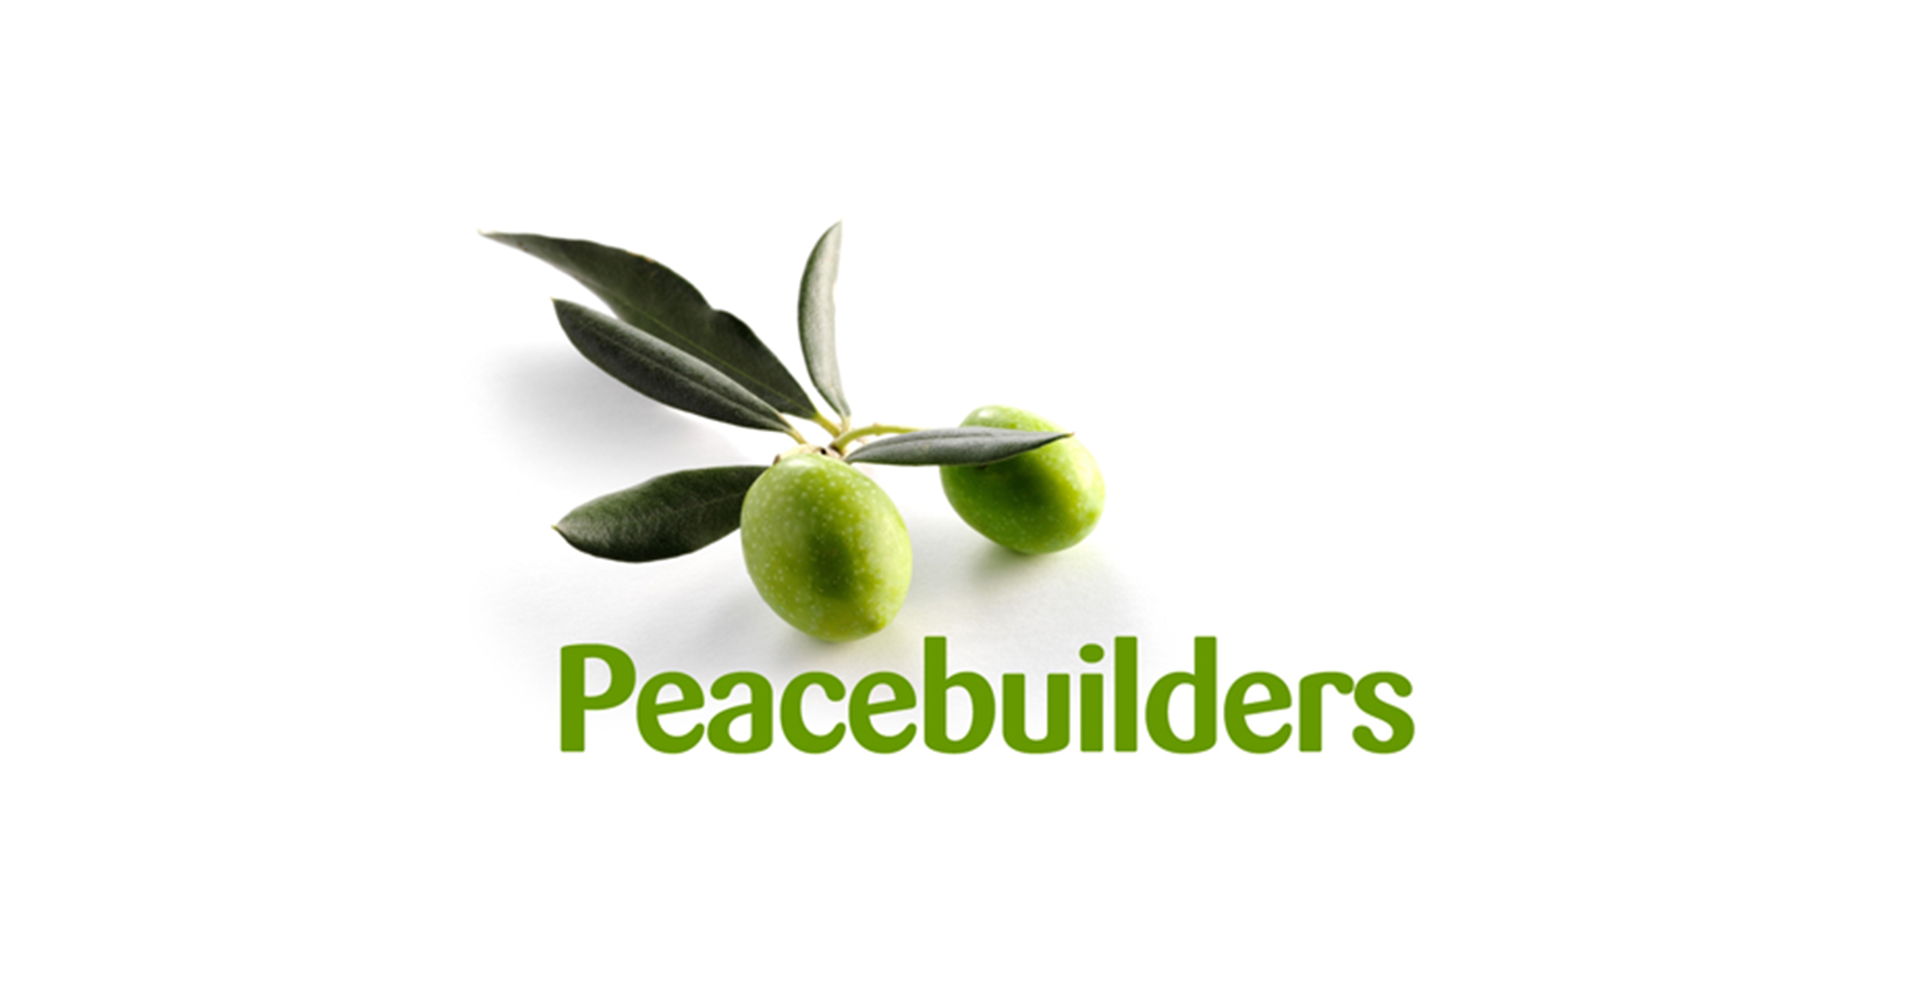 peacebuilders-logo-003